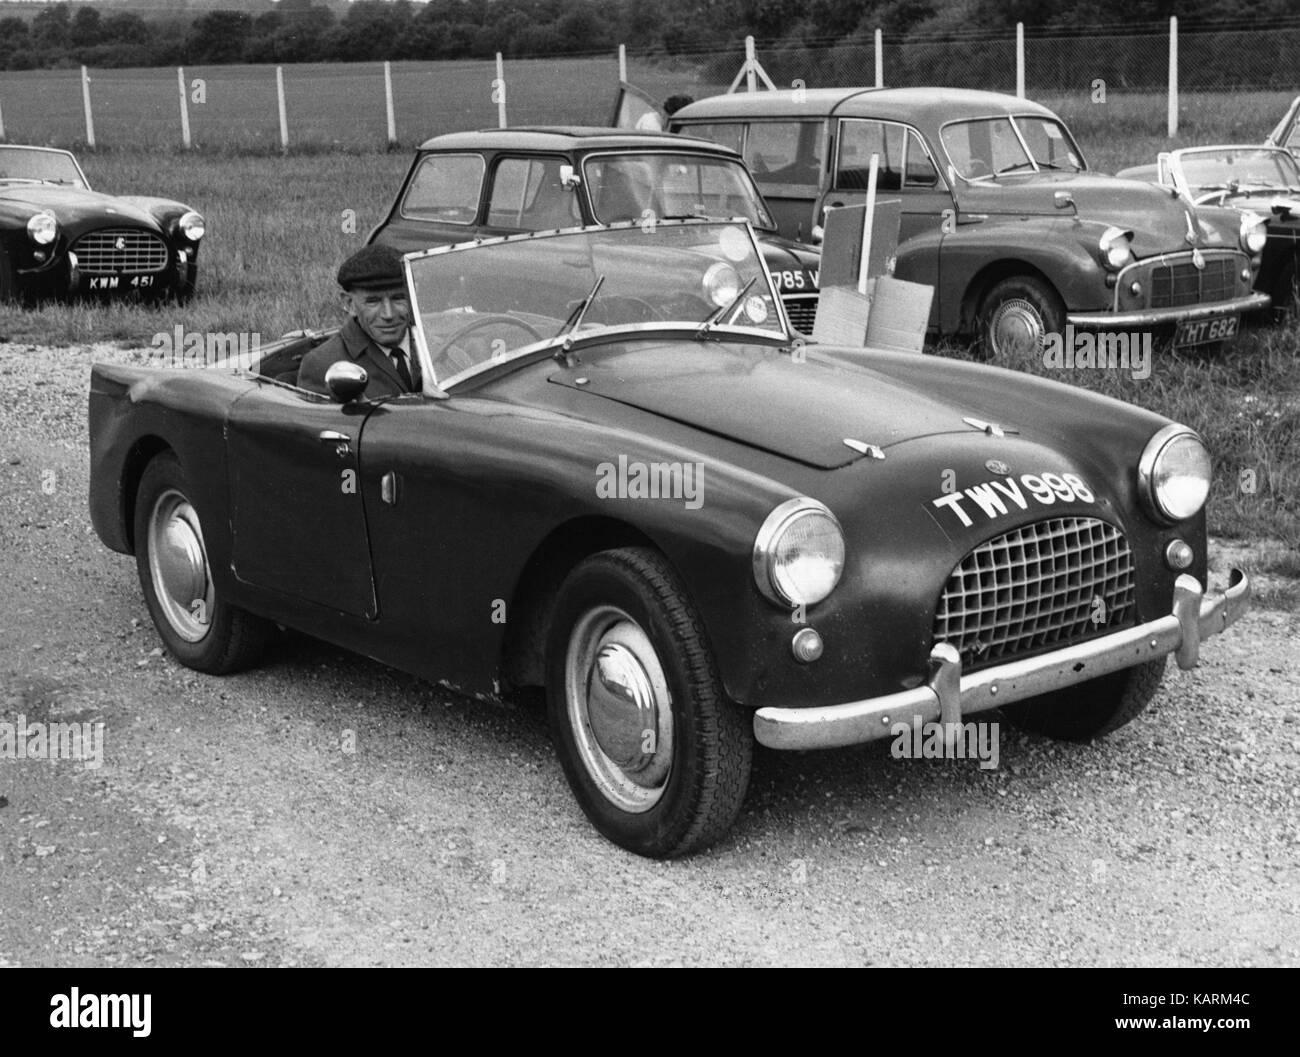 1959 turner a35 sport Immagini Stock